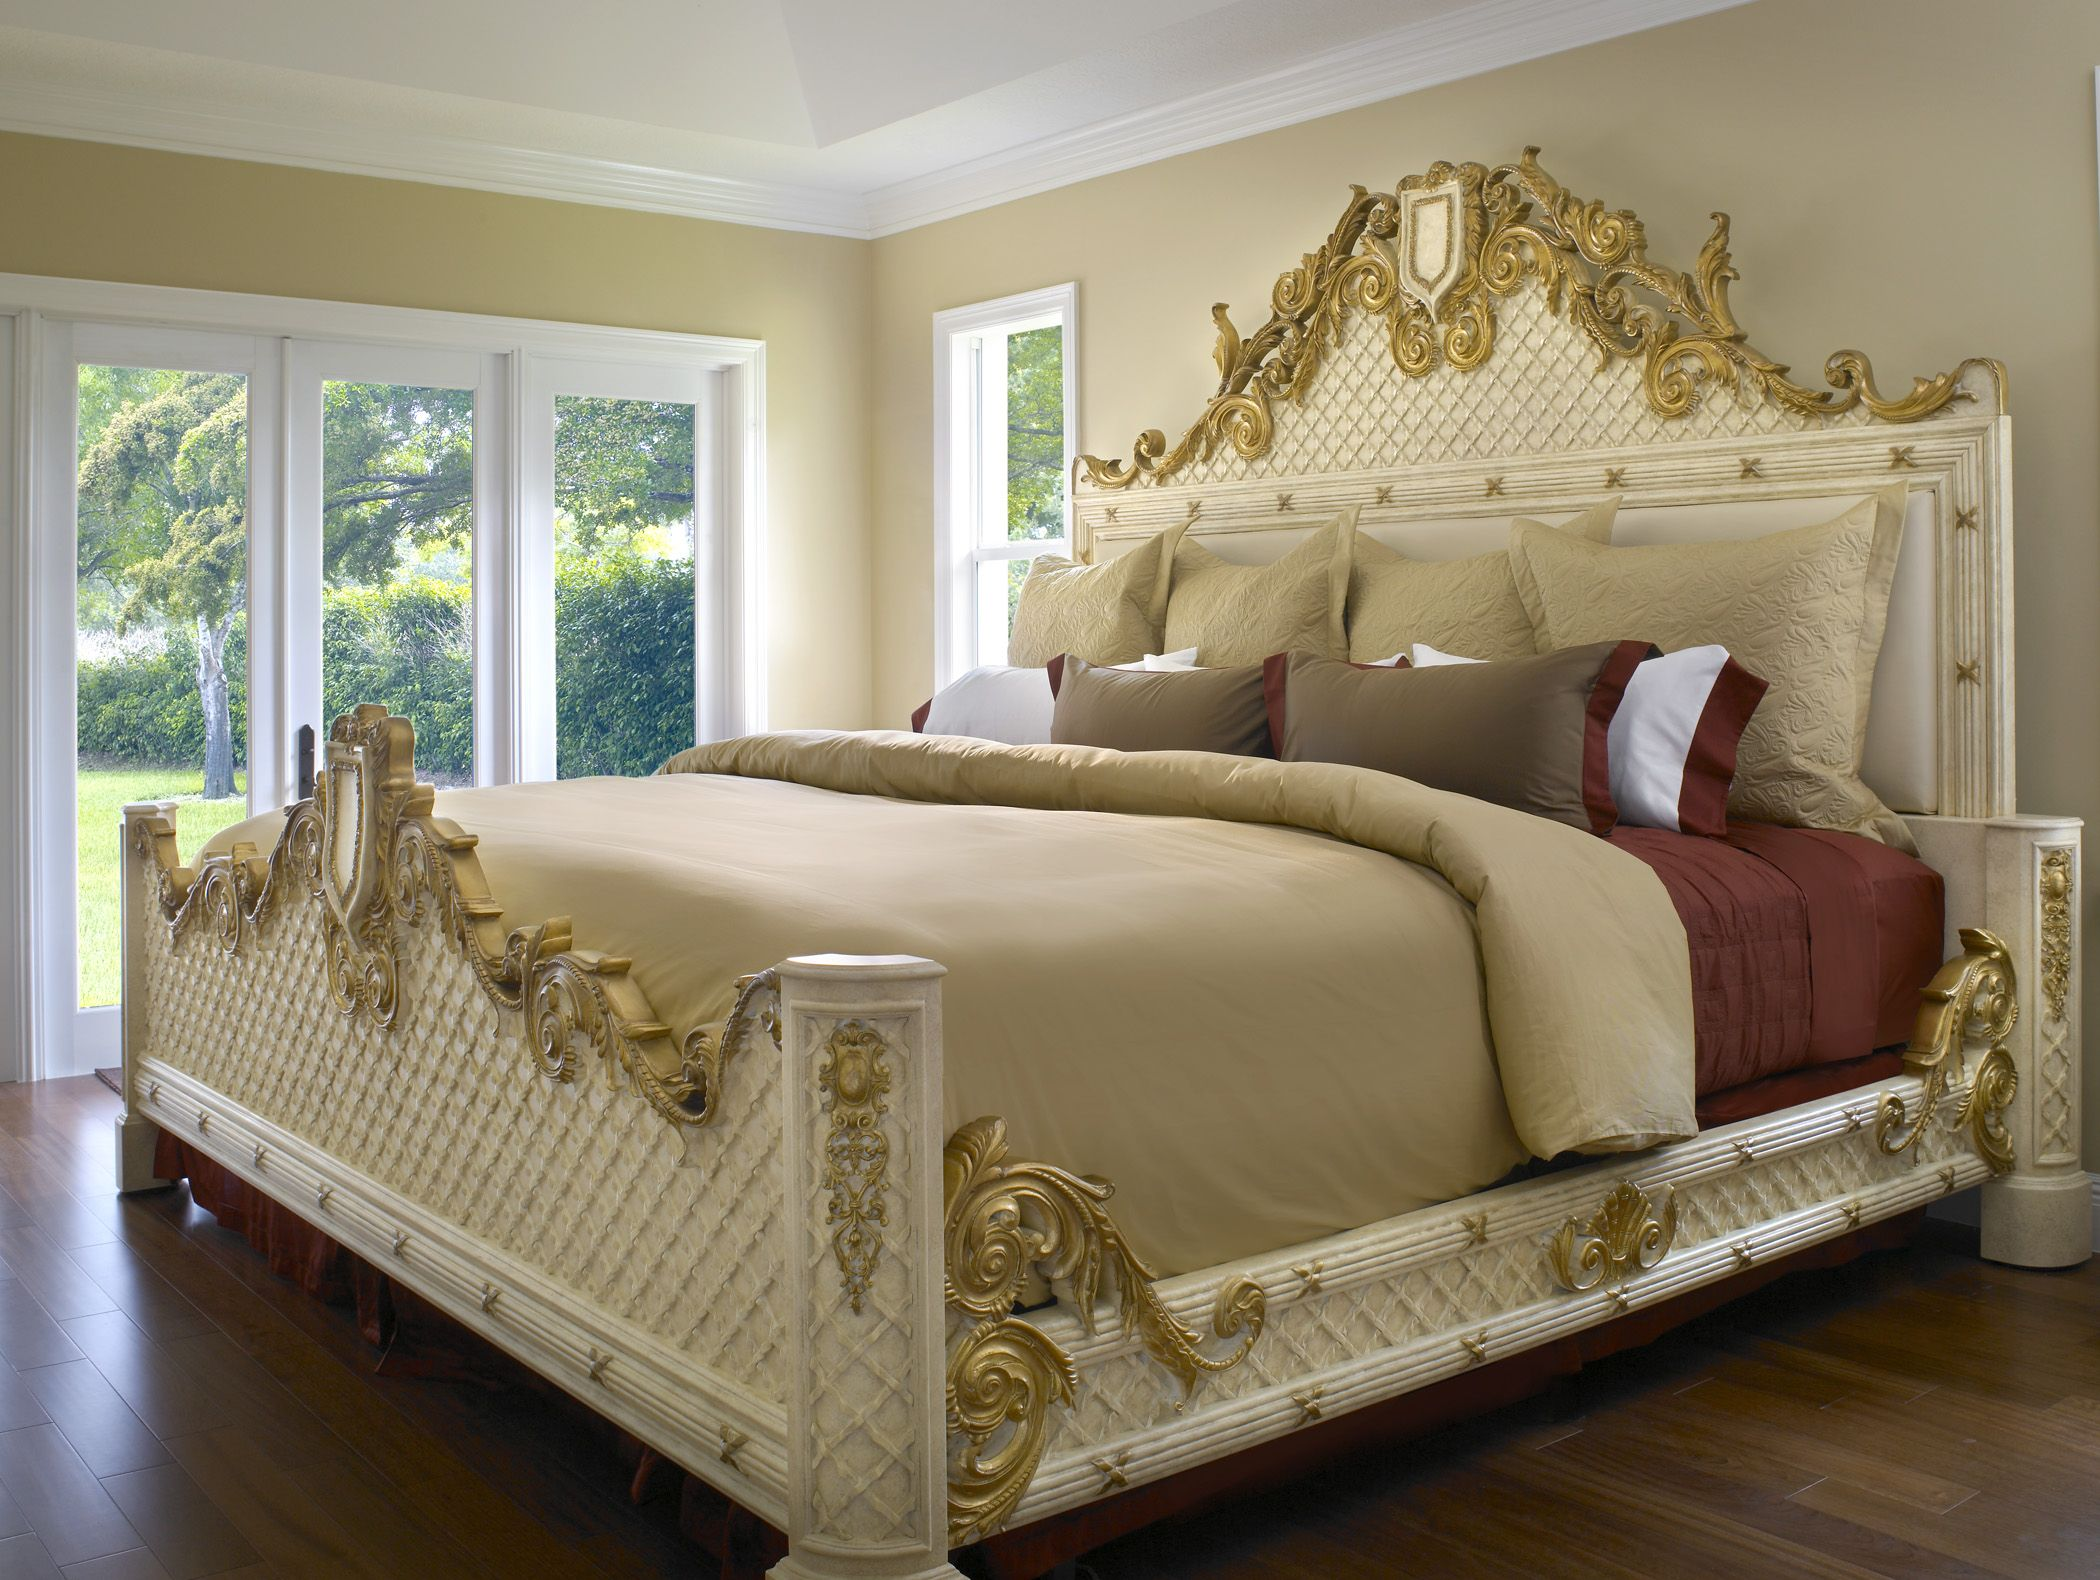 Grand MAREE Luxury UltraKing Size Beds